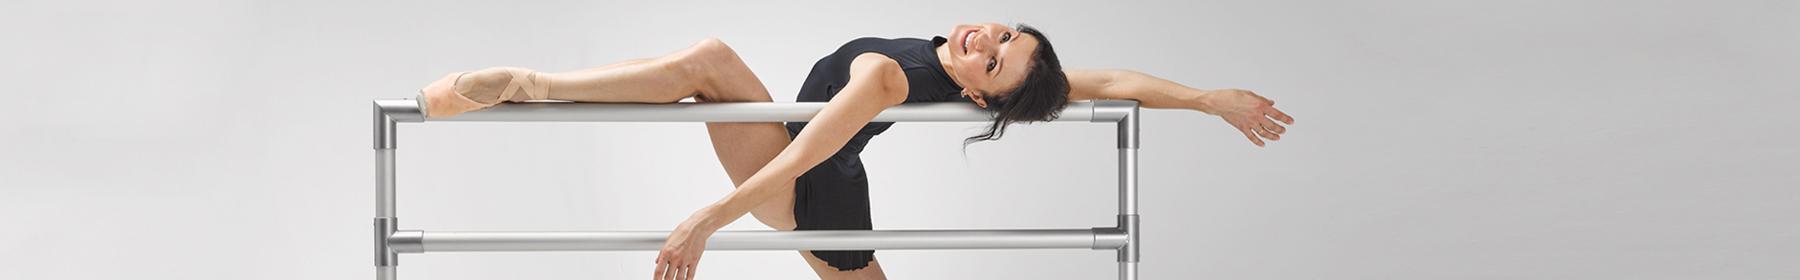 Shop Portable Ballet Barres, Buy Freestanding Barres